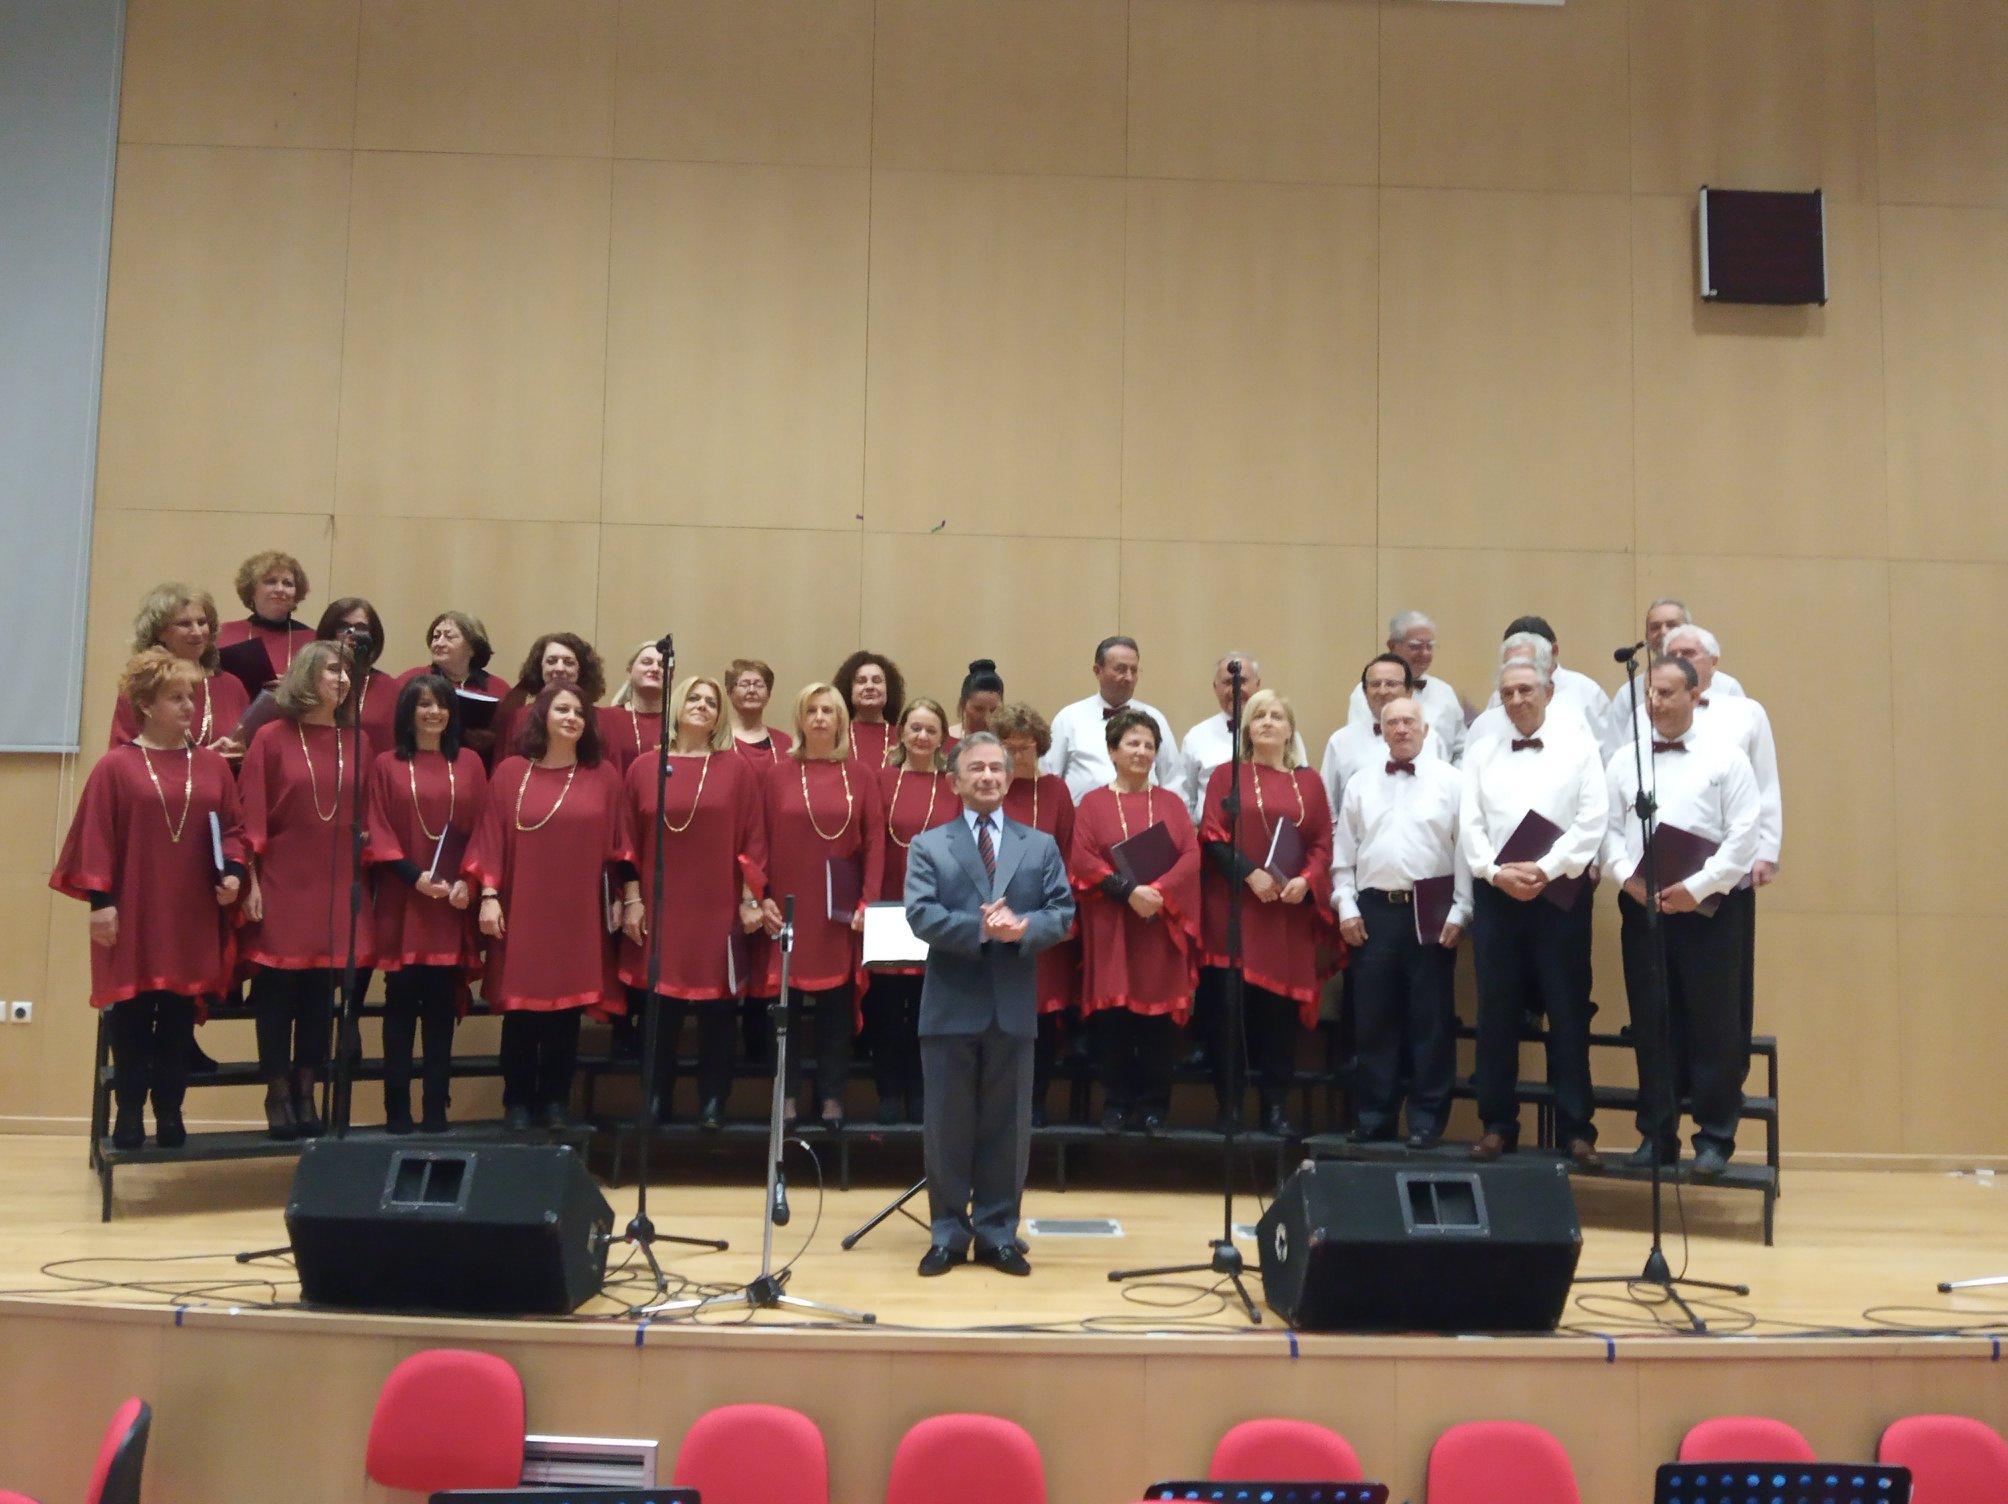 a5666cb8e45 Στη μουσική εκδήλωση «Τραγουδάμε Ελληνικά» (φωτογραφίες) – Φούιτ.gr